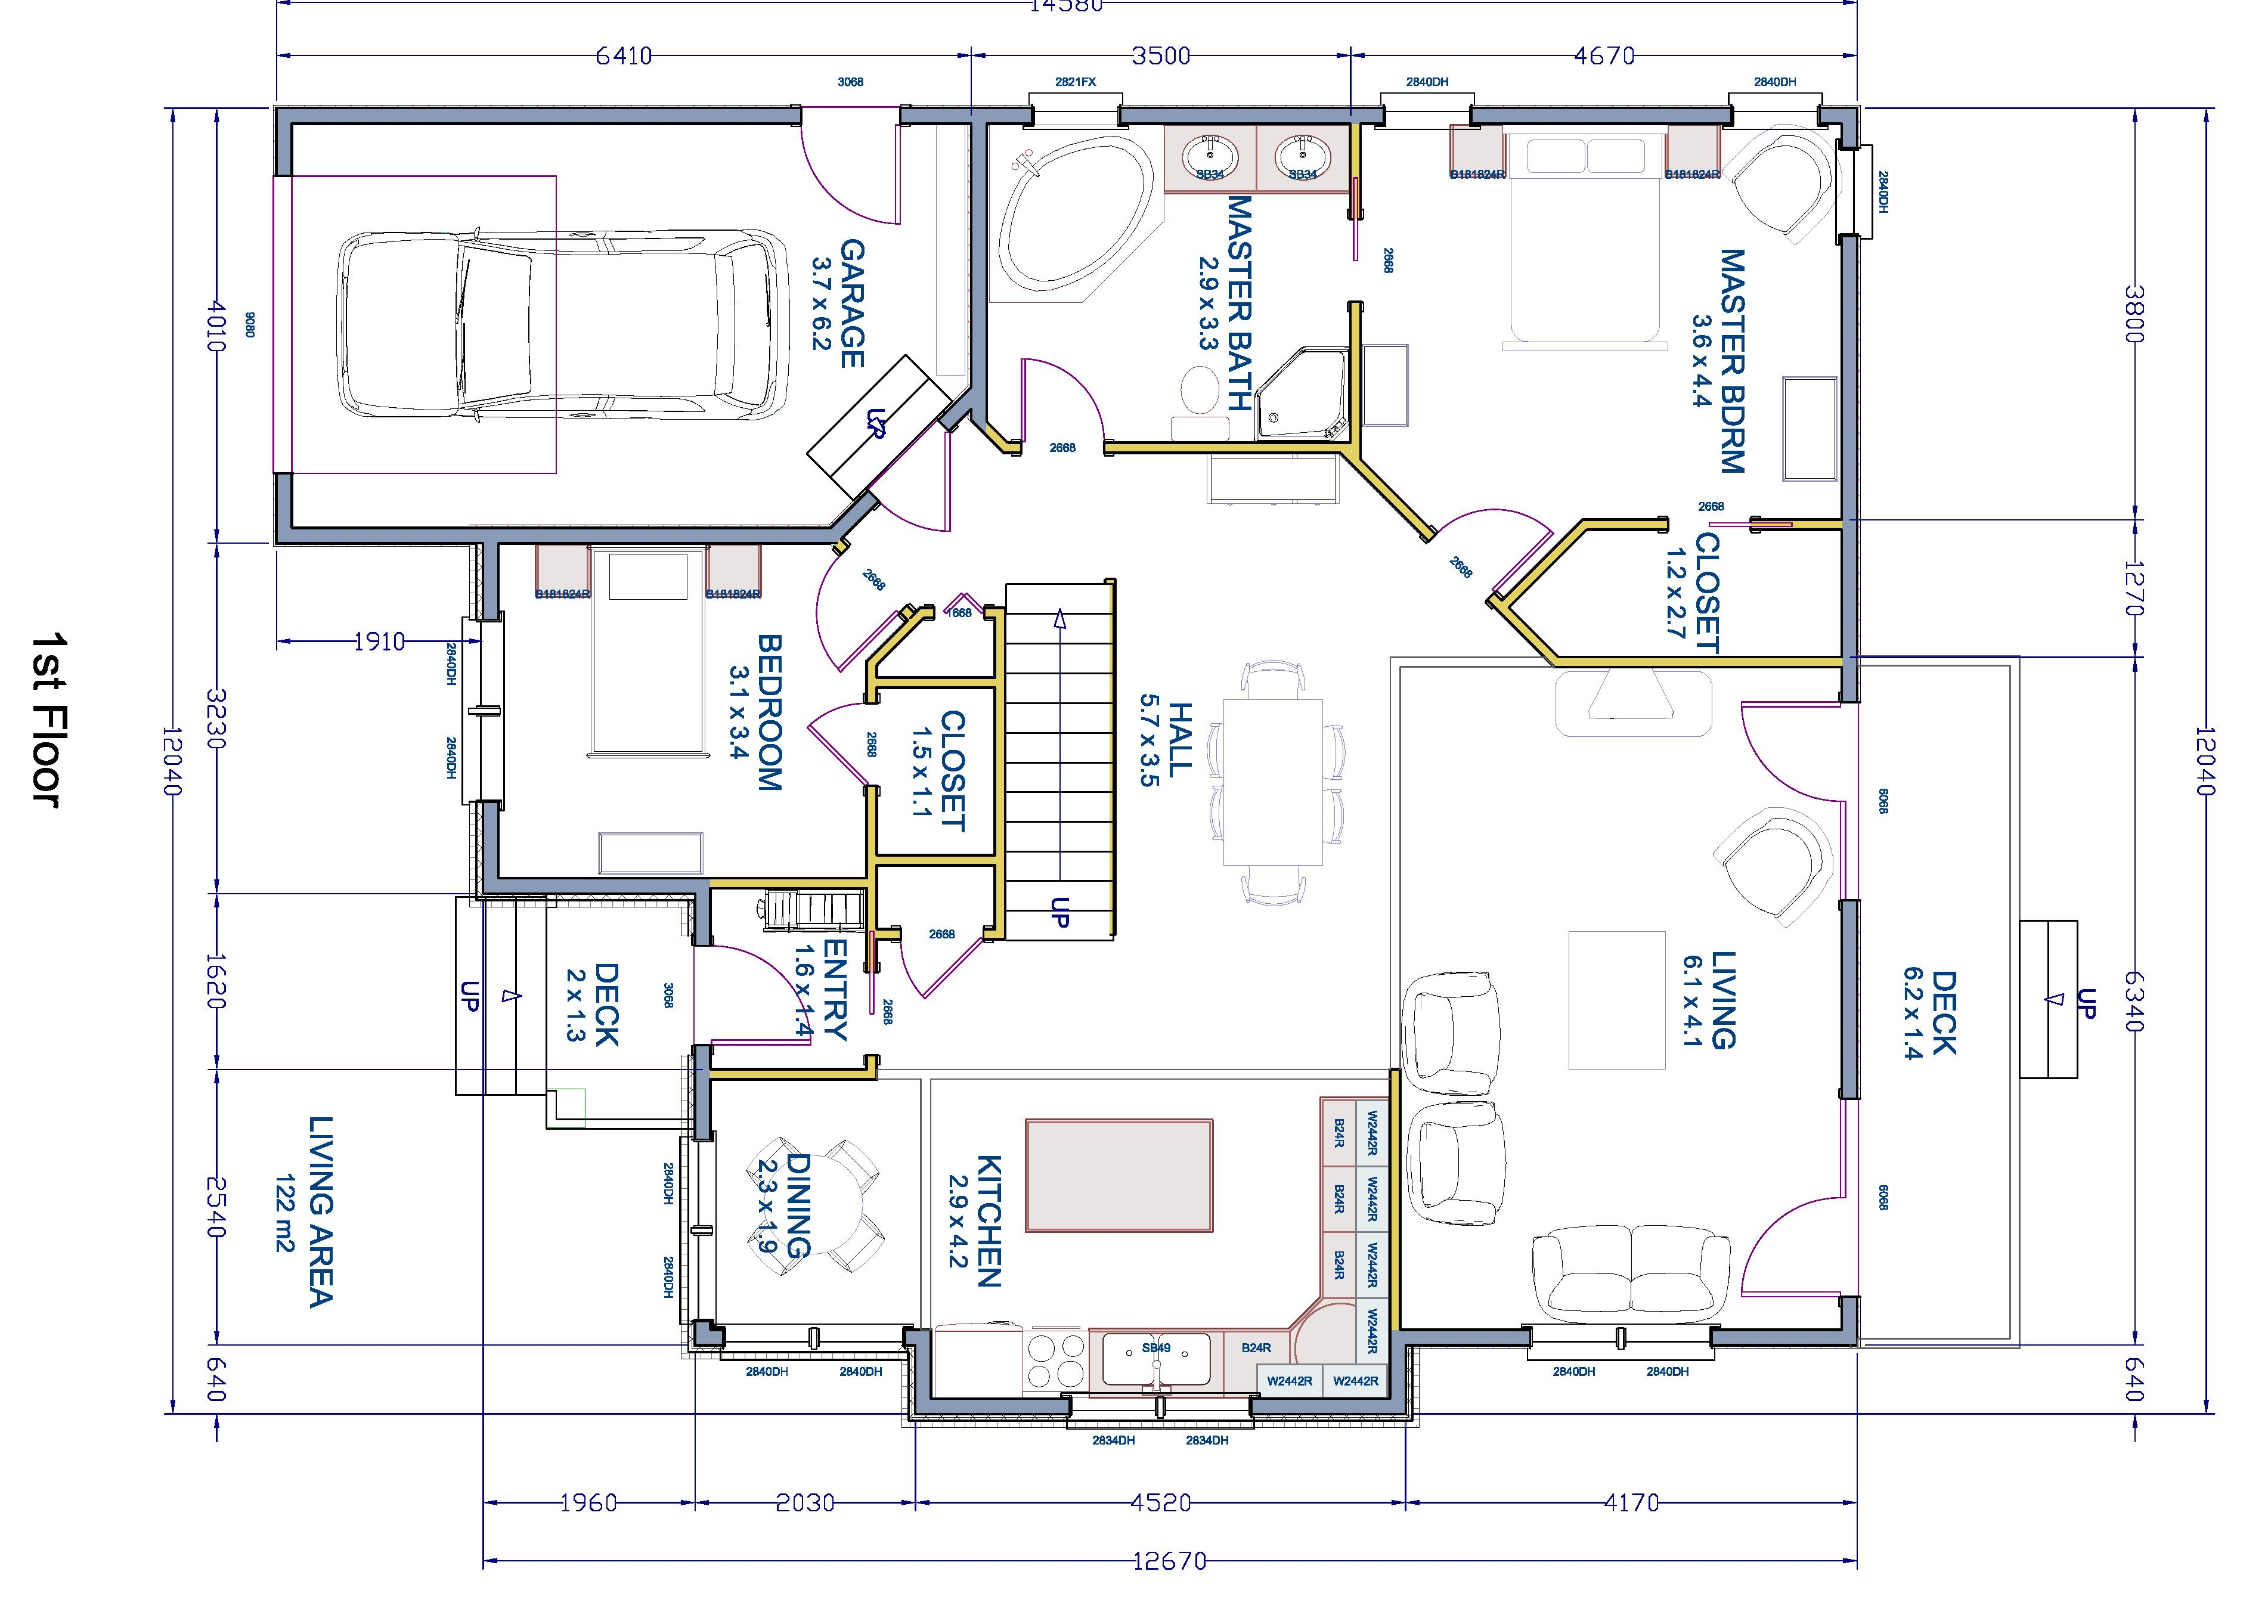 Latest Posts Under: Bathroom dimensions | bathroom design 2017-2018 ...